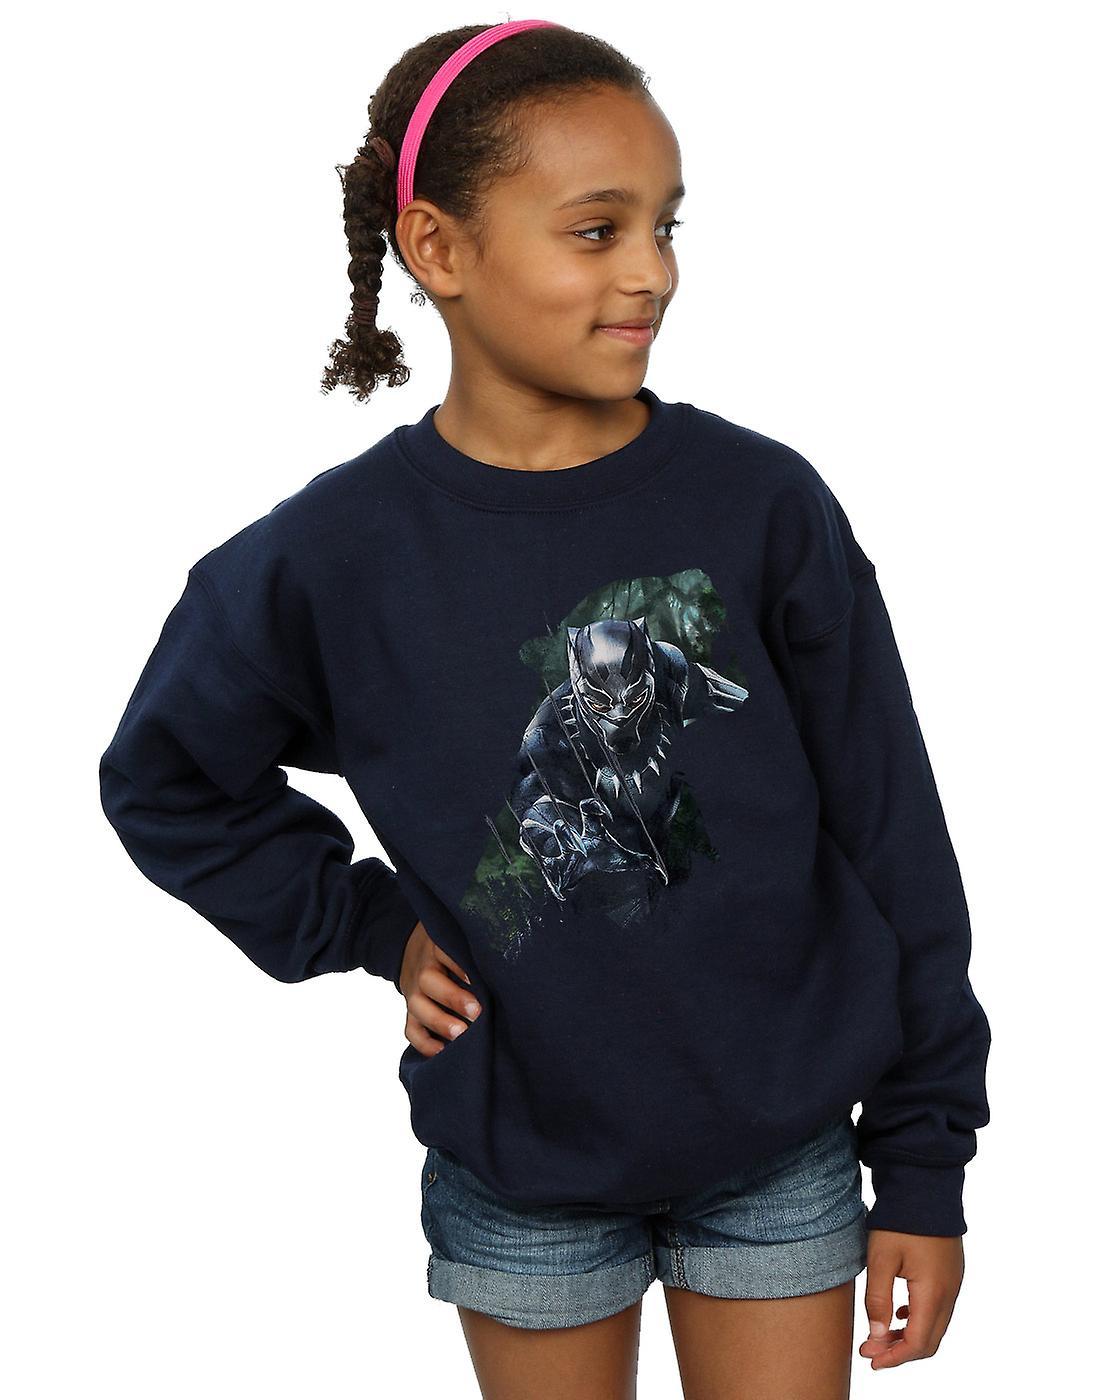 Merveille Girls noir panthère sauvage Silhouette Sweatshirt